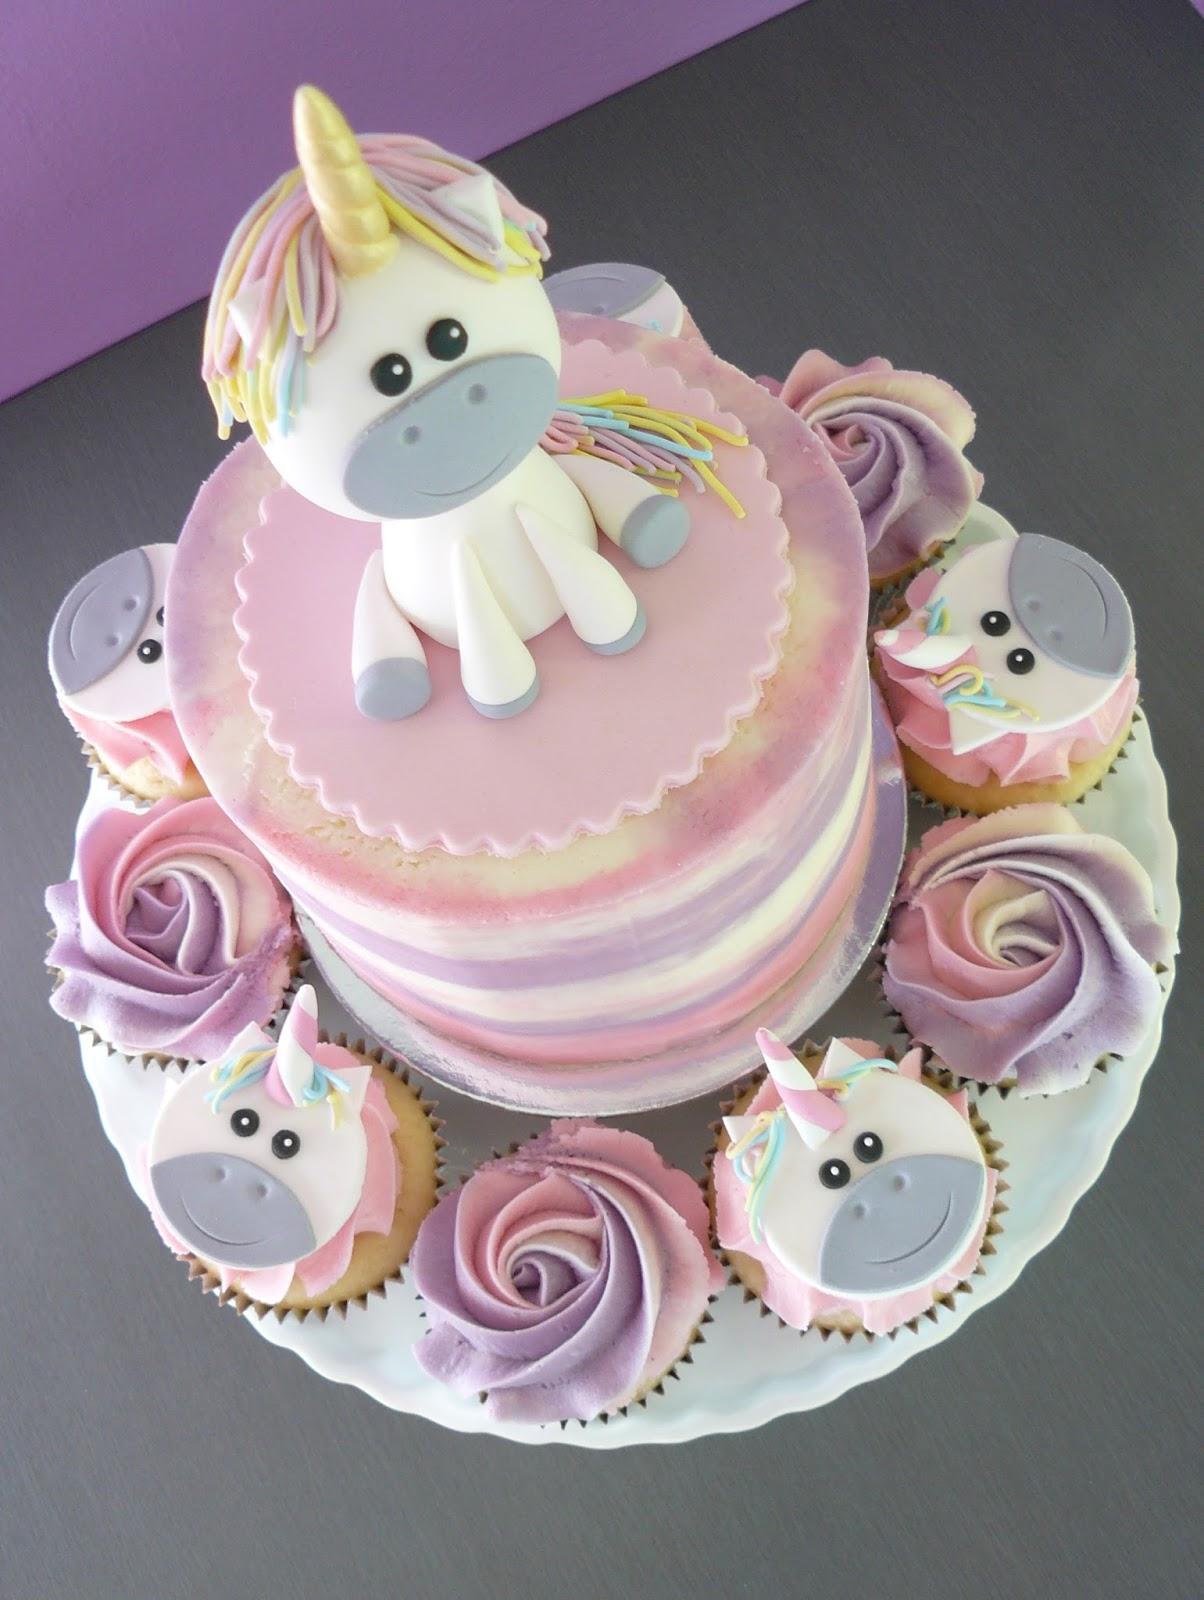 Customised birthday cakes in bangalore dating 3